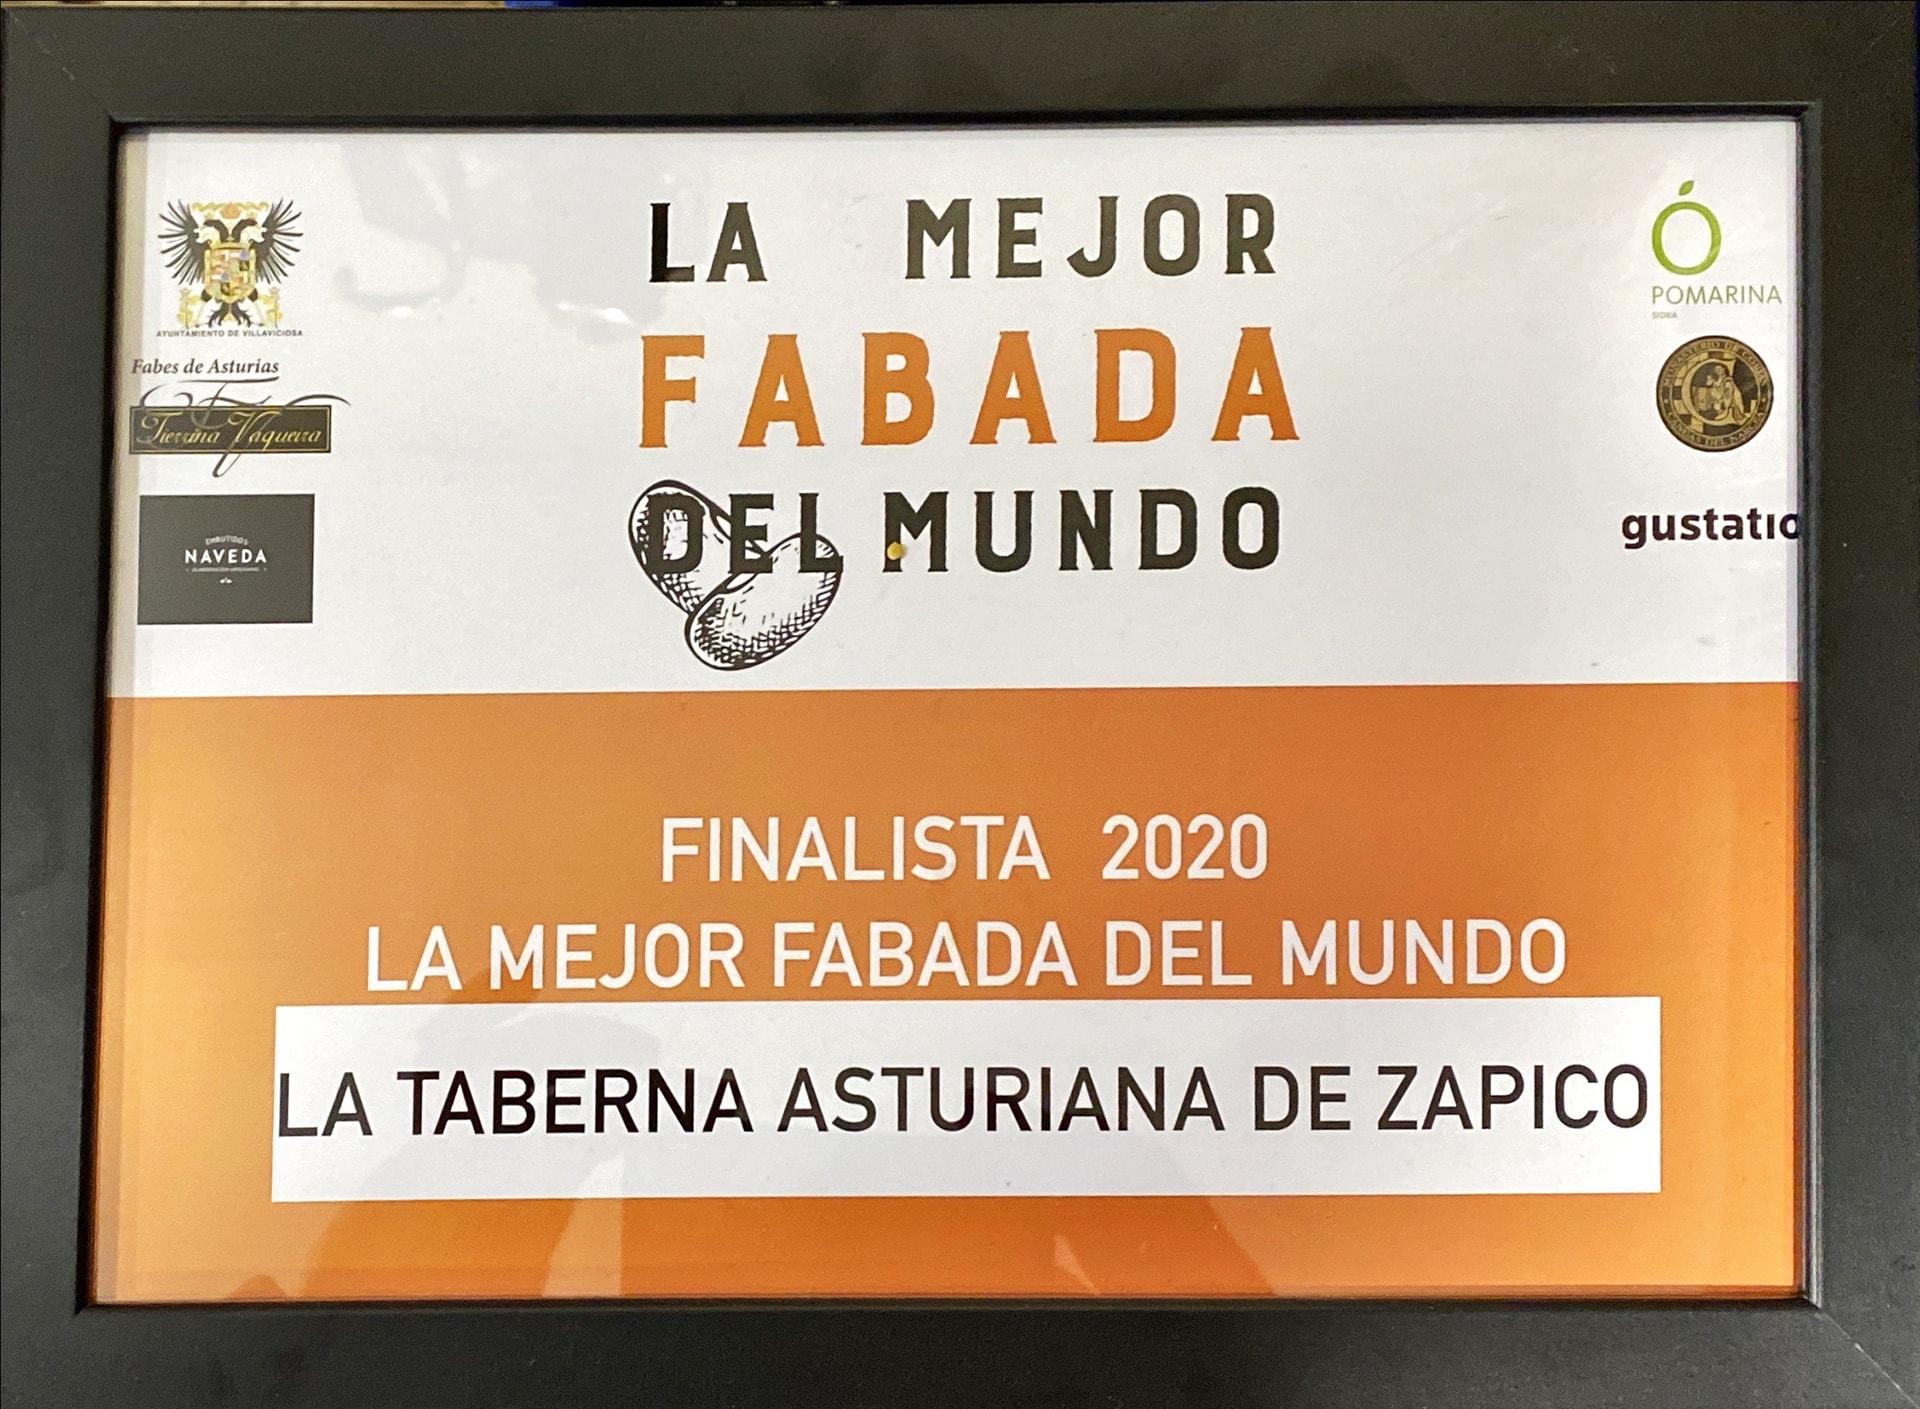 Finalista 2020 Mejor Fabada del Mundo Taberna Asturiana Zapico